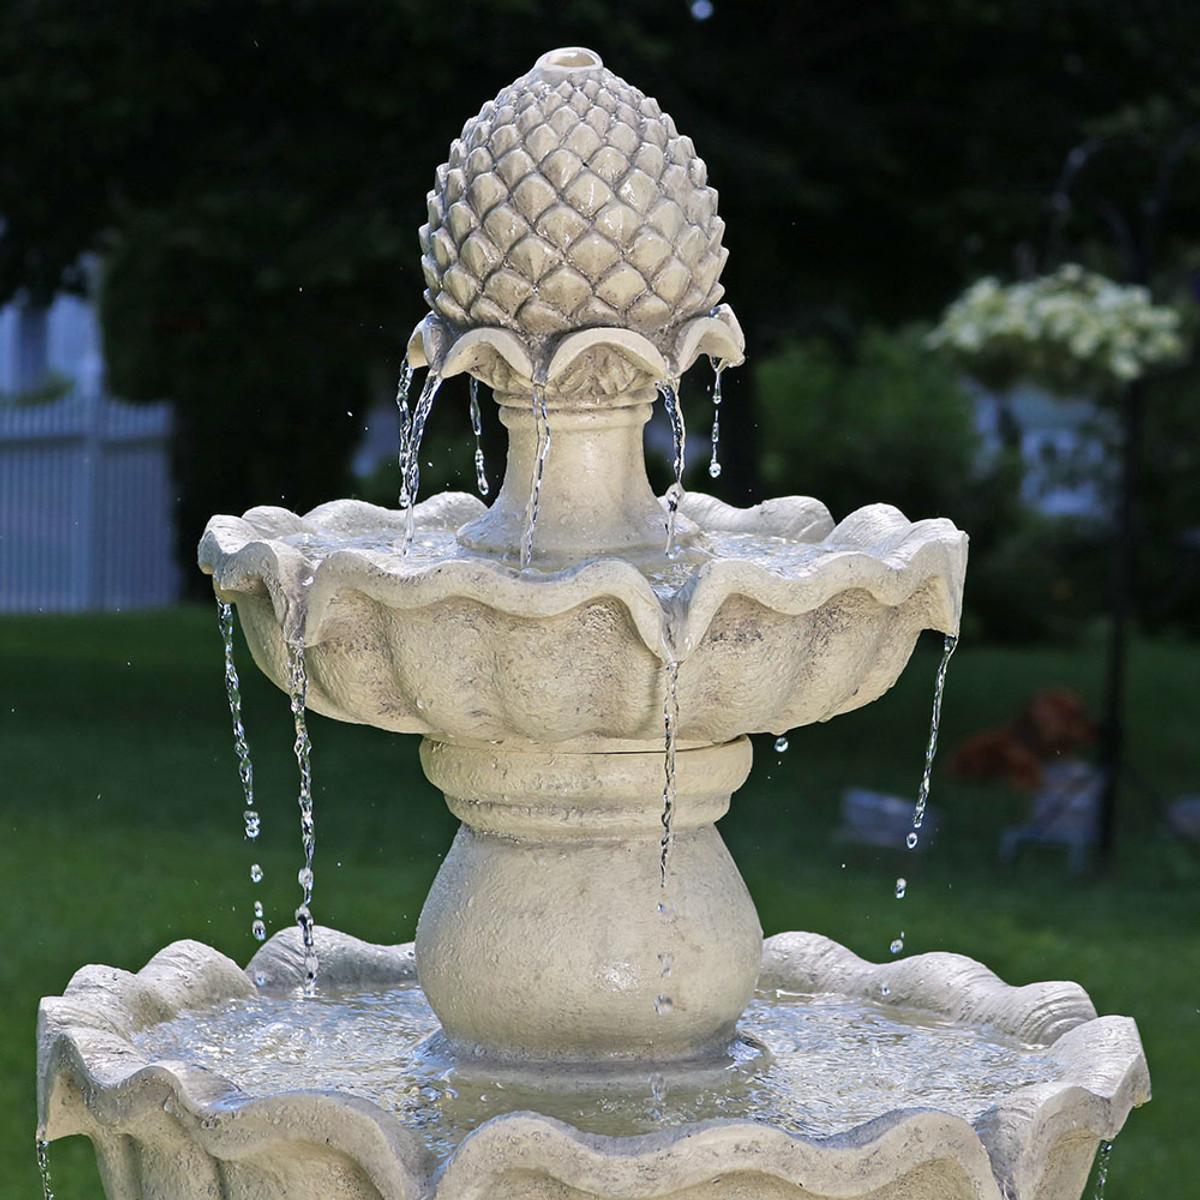 Sunnydaze Three Tier Outdoor Pineapple Garden Fountain